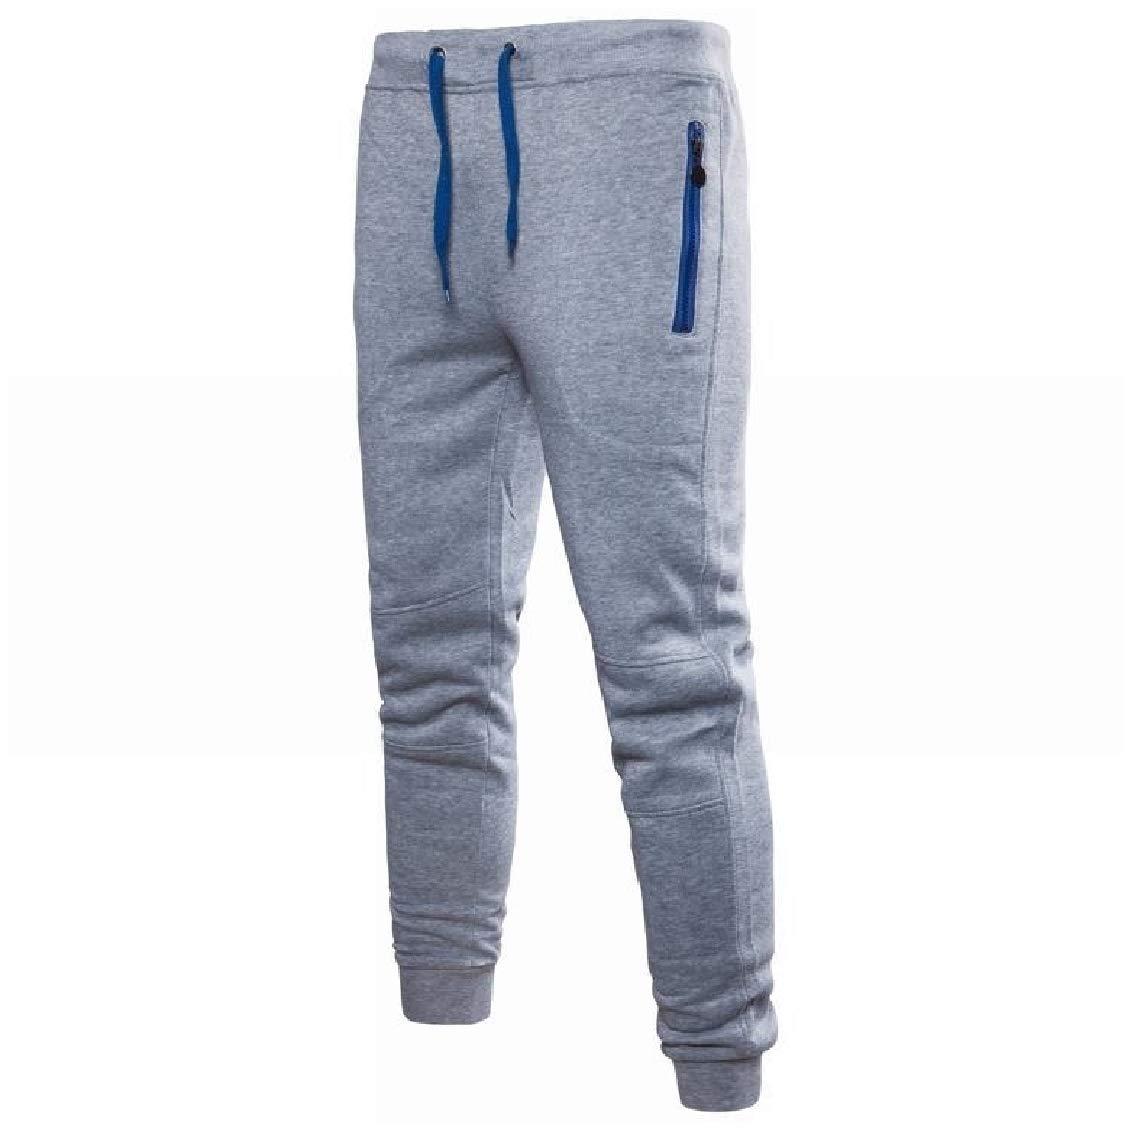 Coolred-Men Plus Size Pockets Zip Drawstring Elastic Waist Lounge Sports Pants